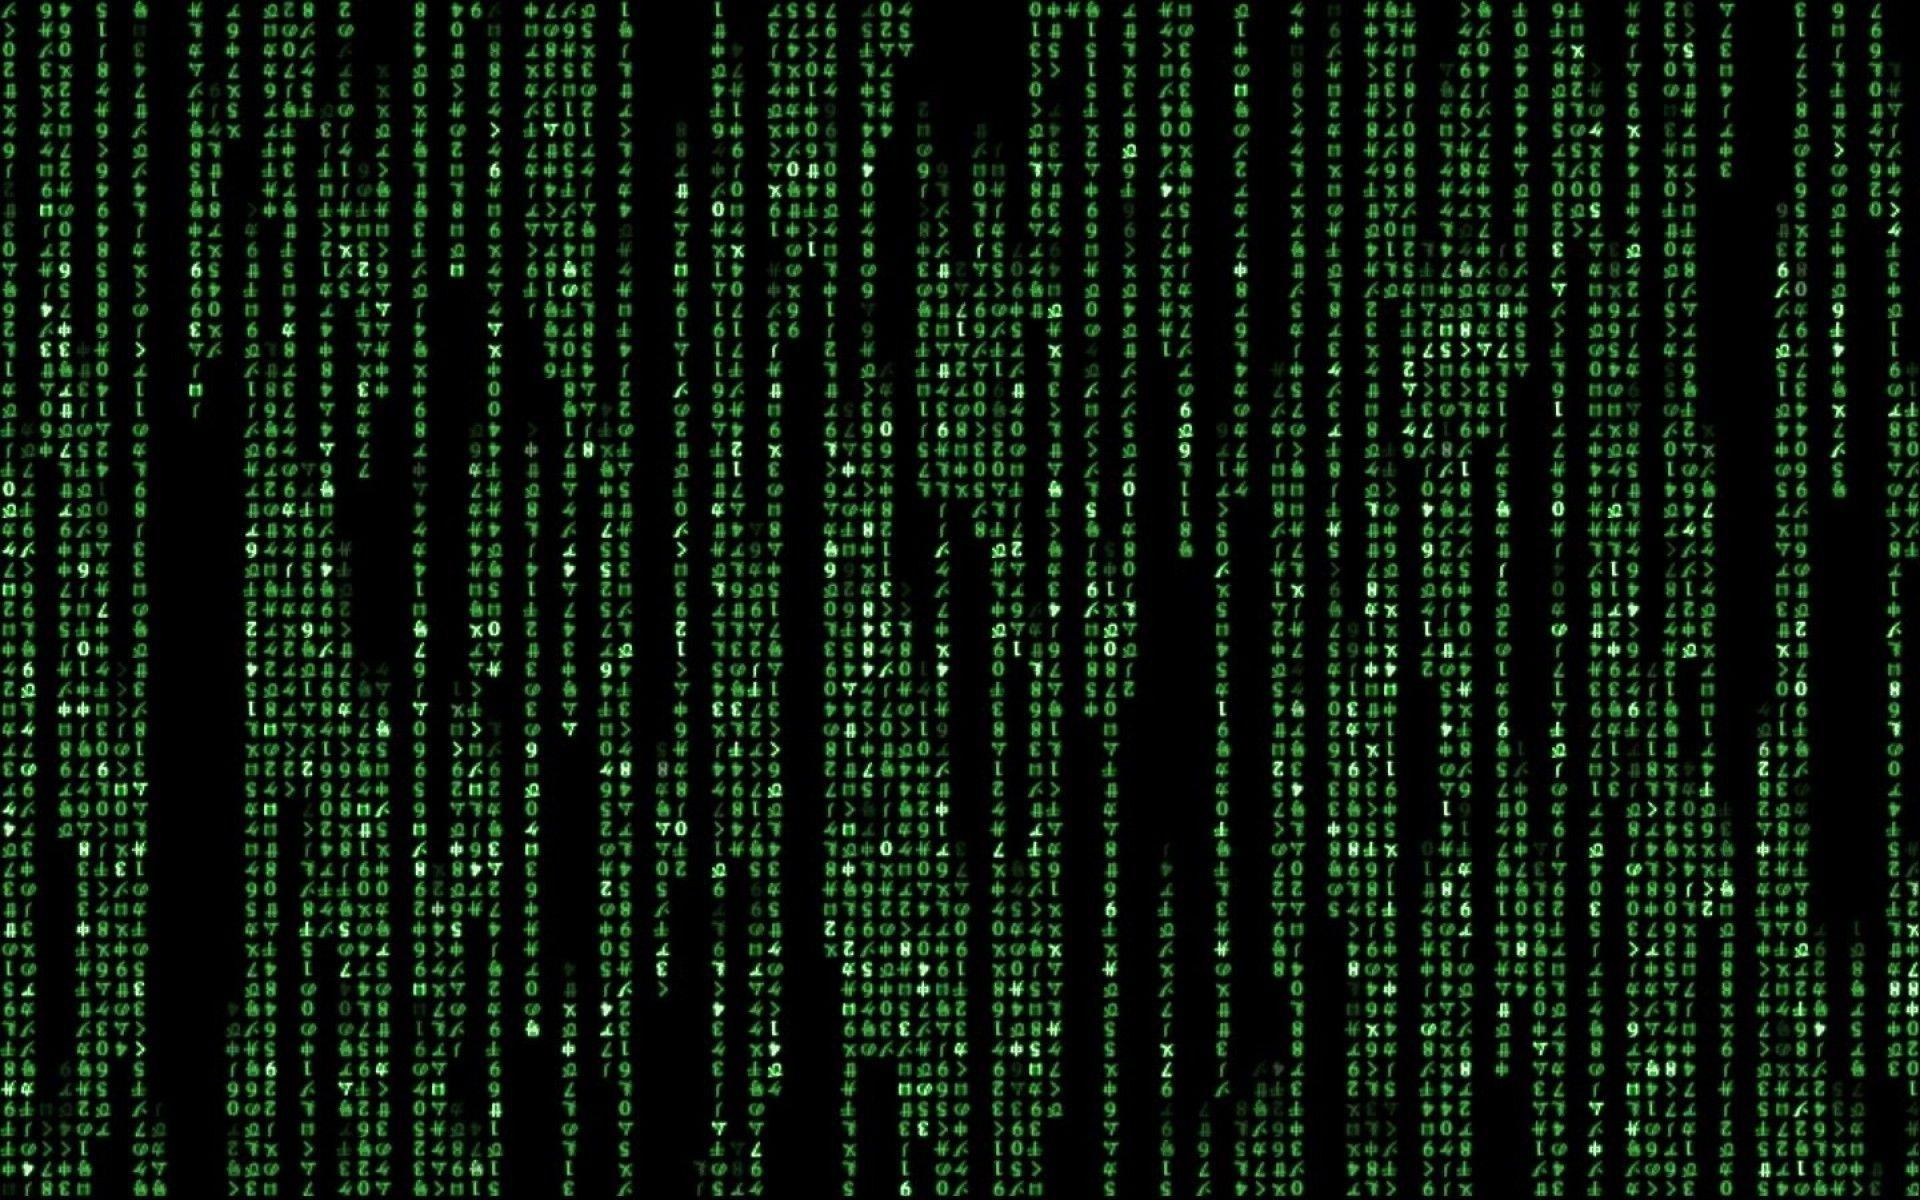 1920x1200 Animated Matrix Wallpaper Animated Desktop Backgrounds